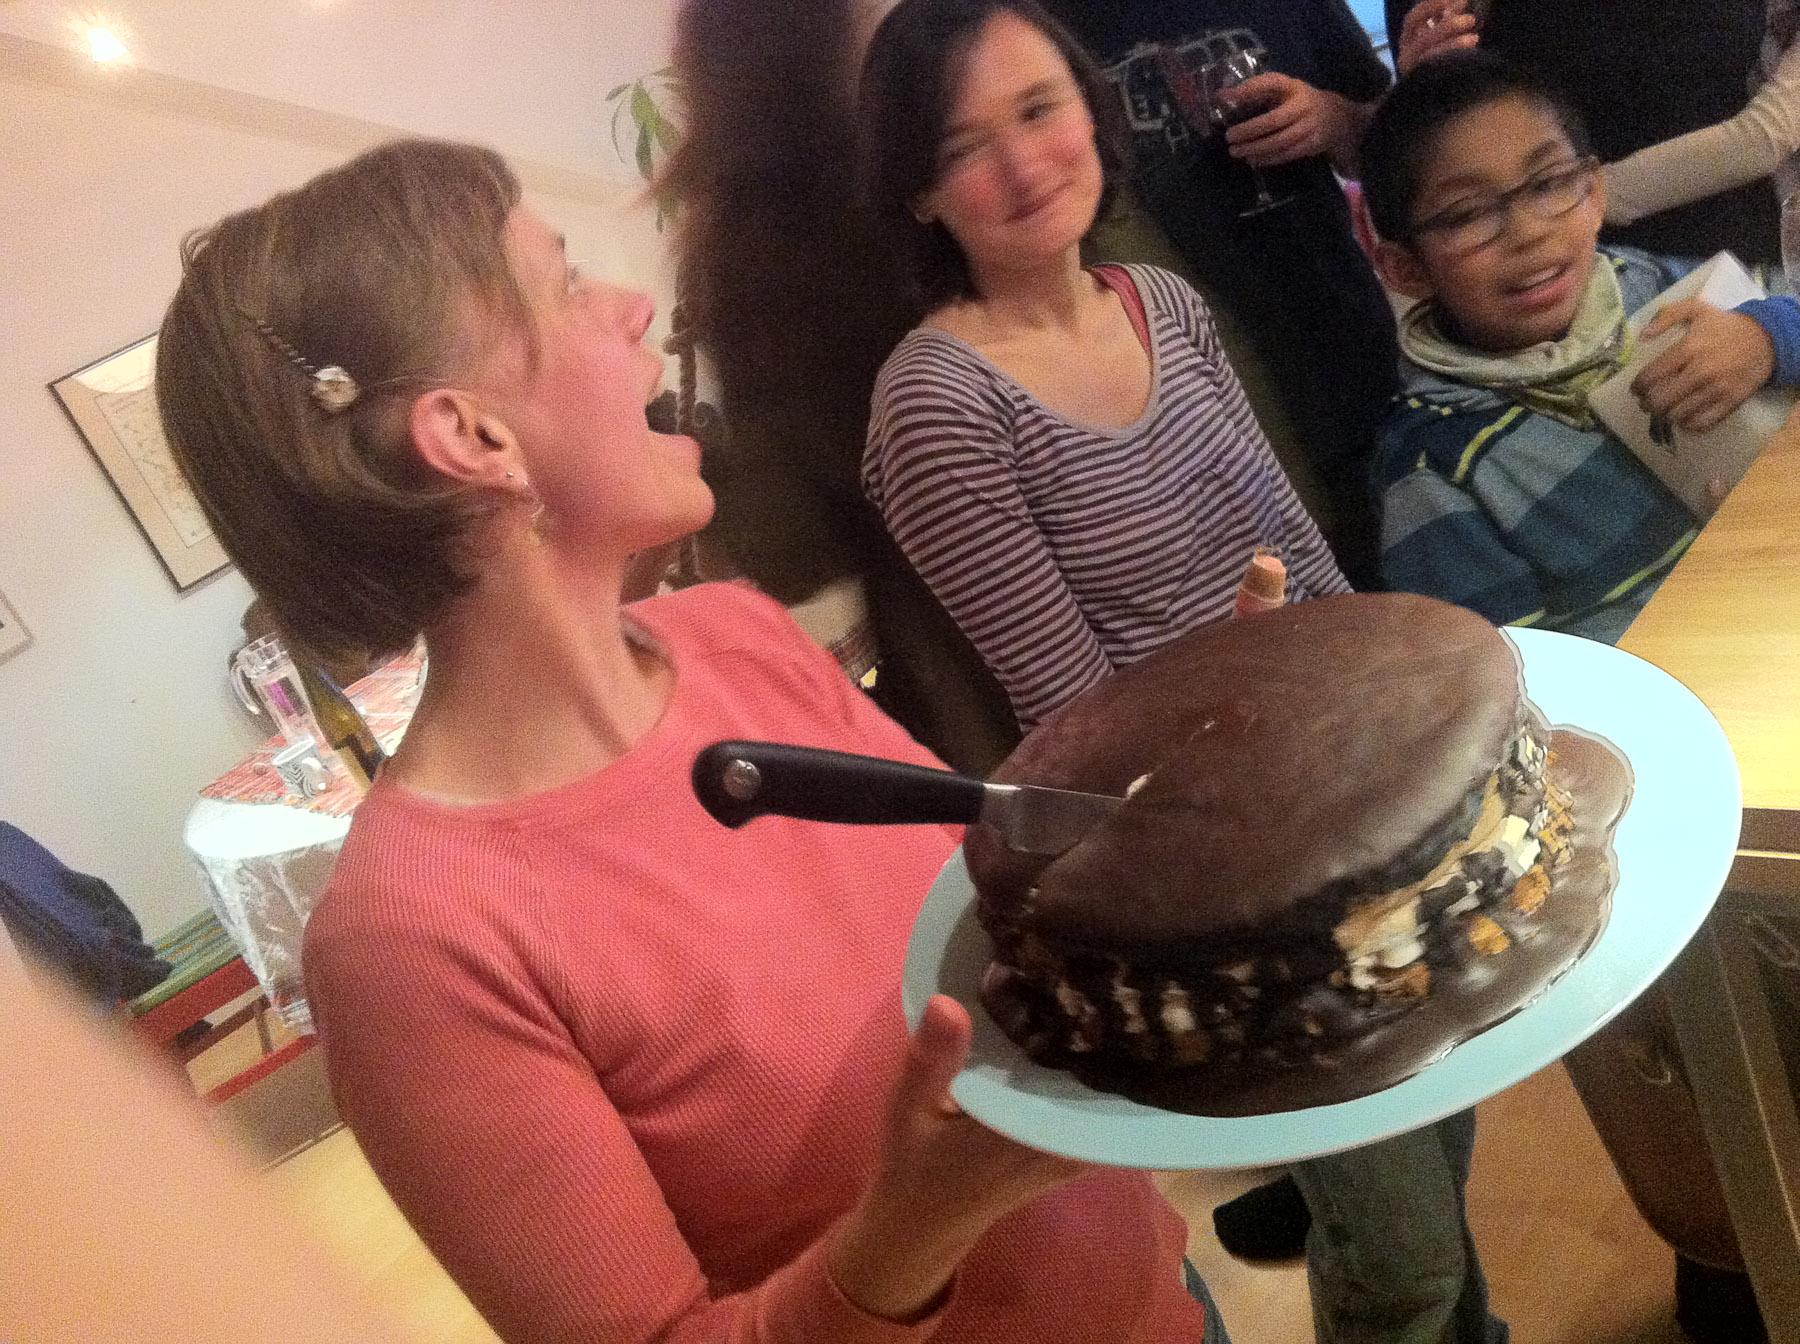 Lavish Chocolate Meringue Cake, in the process of celebratory dismemberment